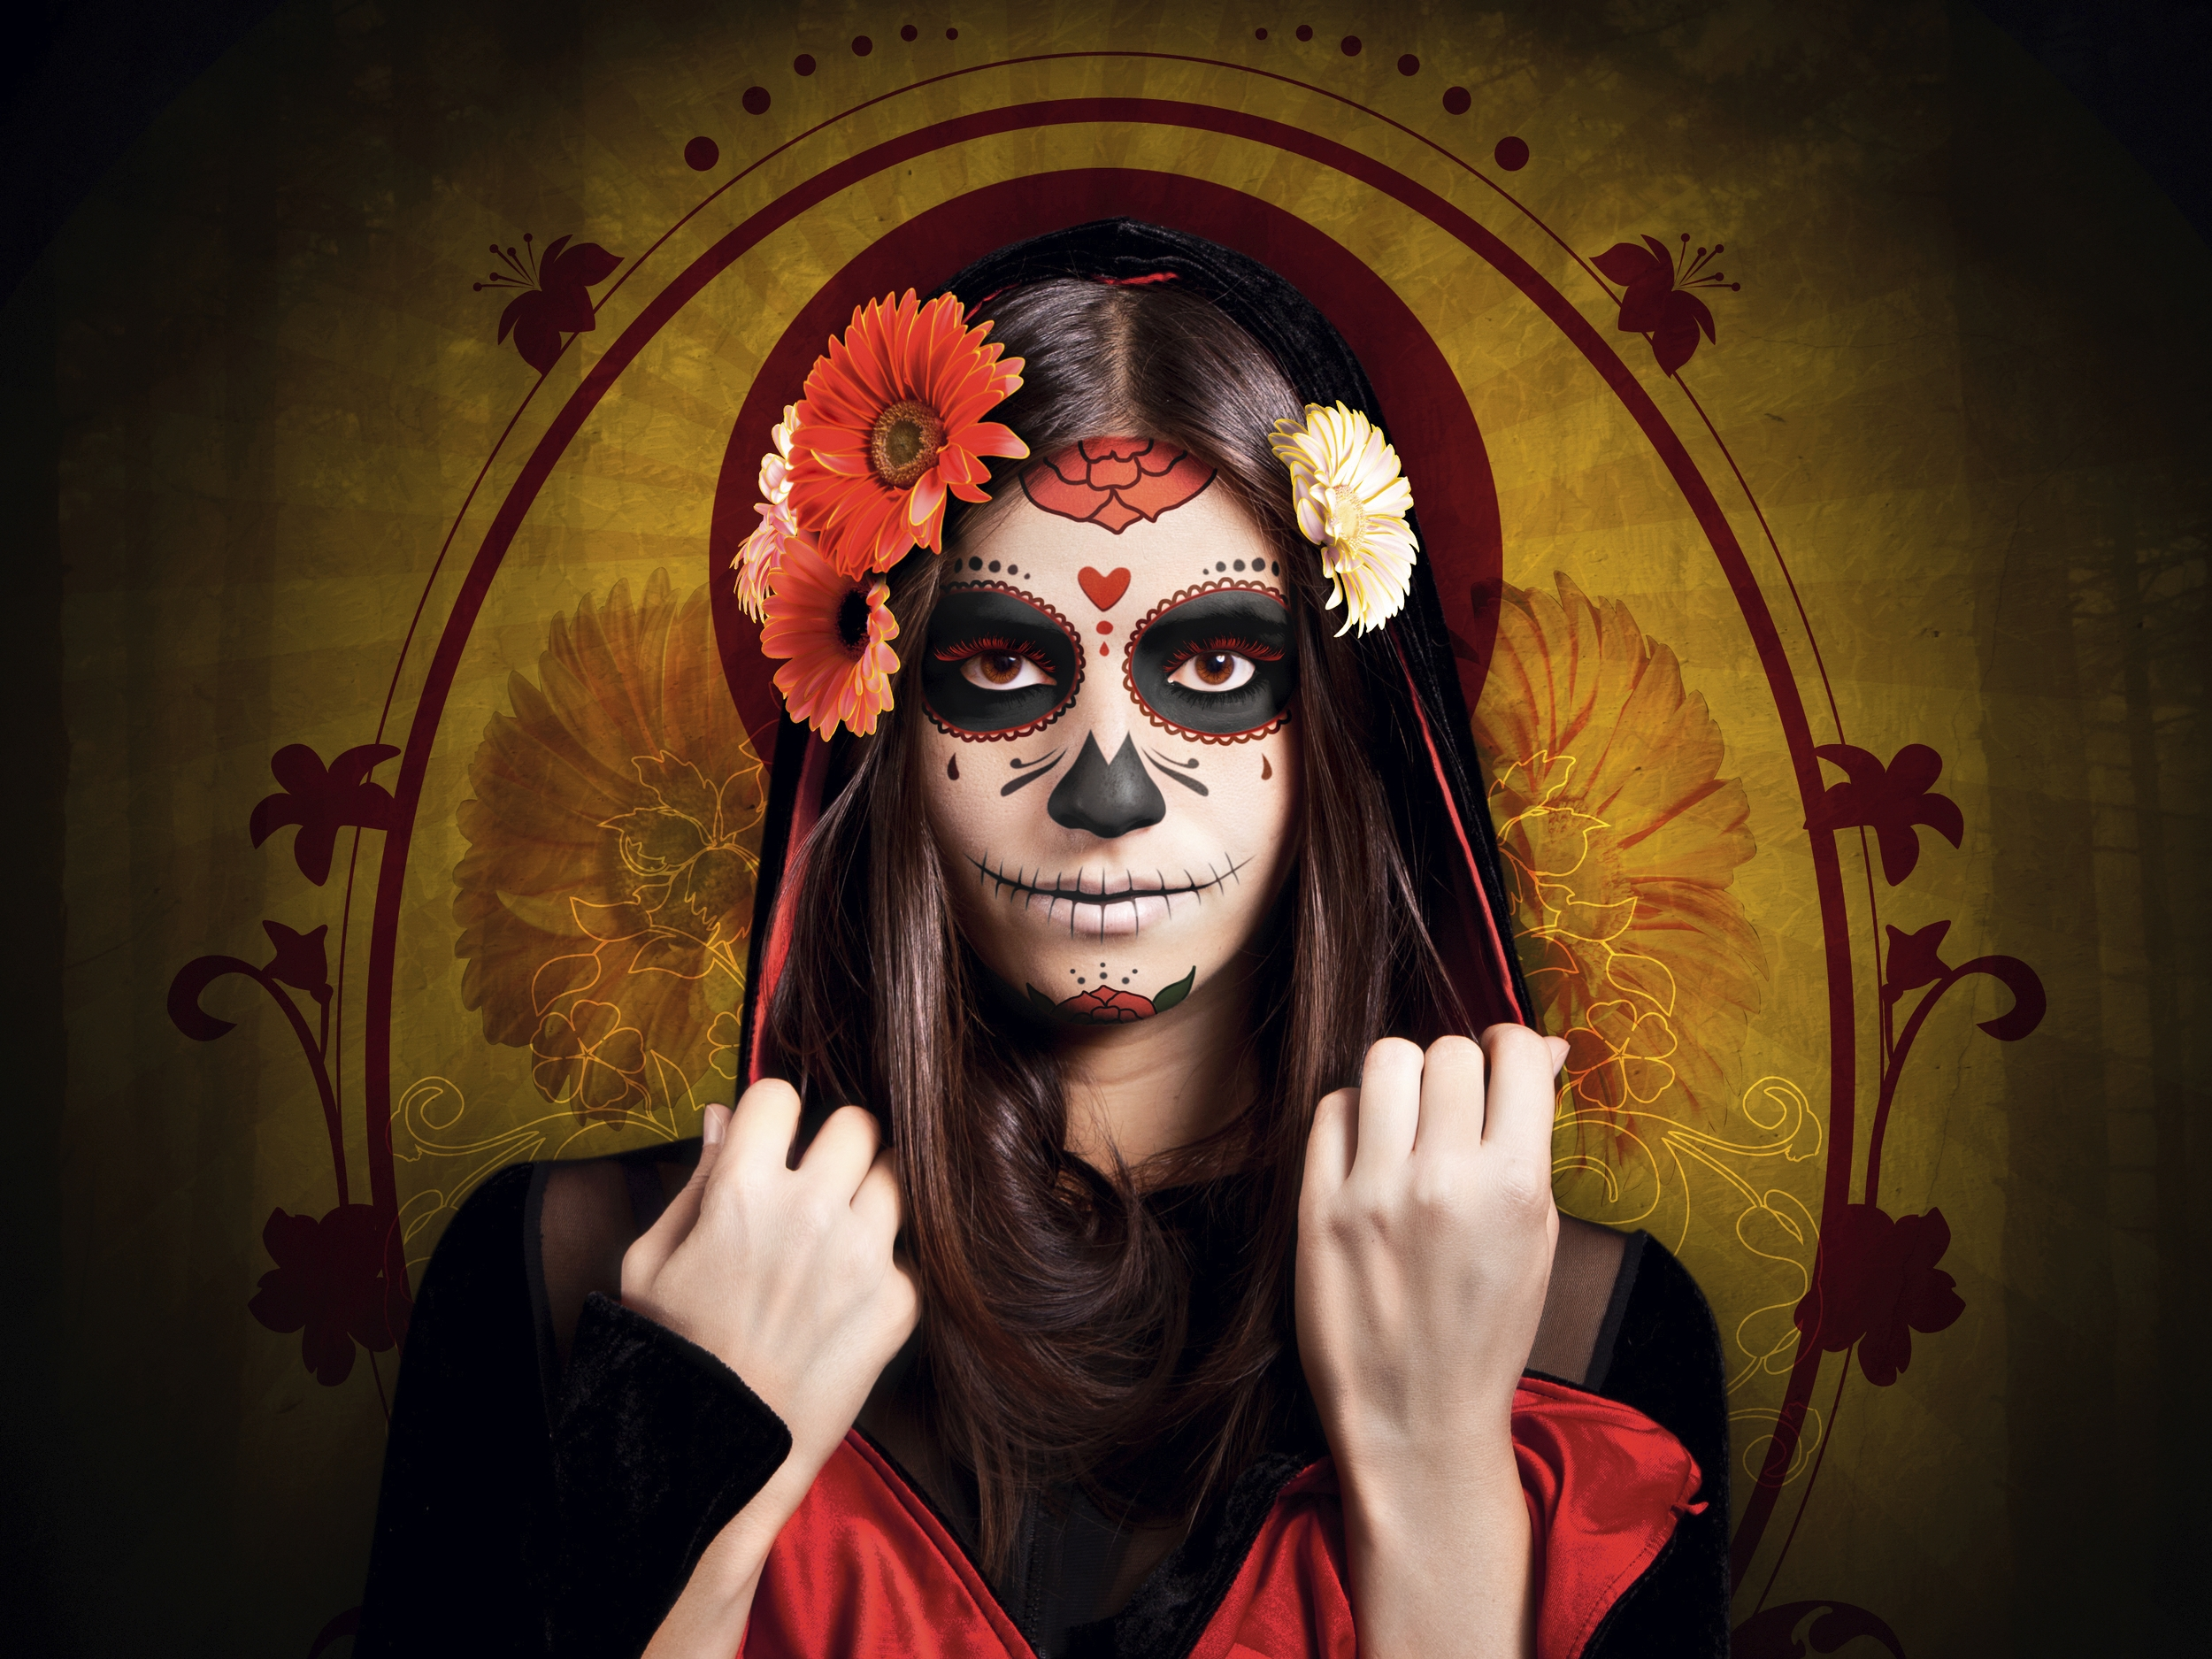 DAY OF THE DEAD   Music by Matt Hahn, Battery by Chris Cruz-Vargas